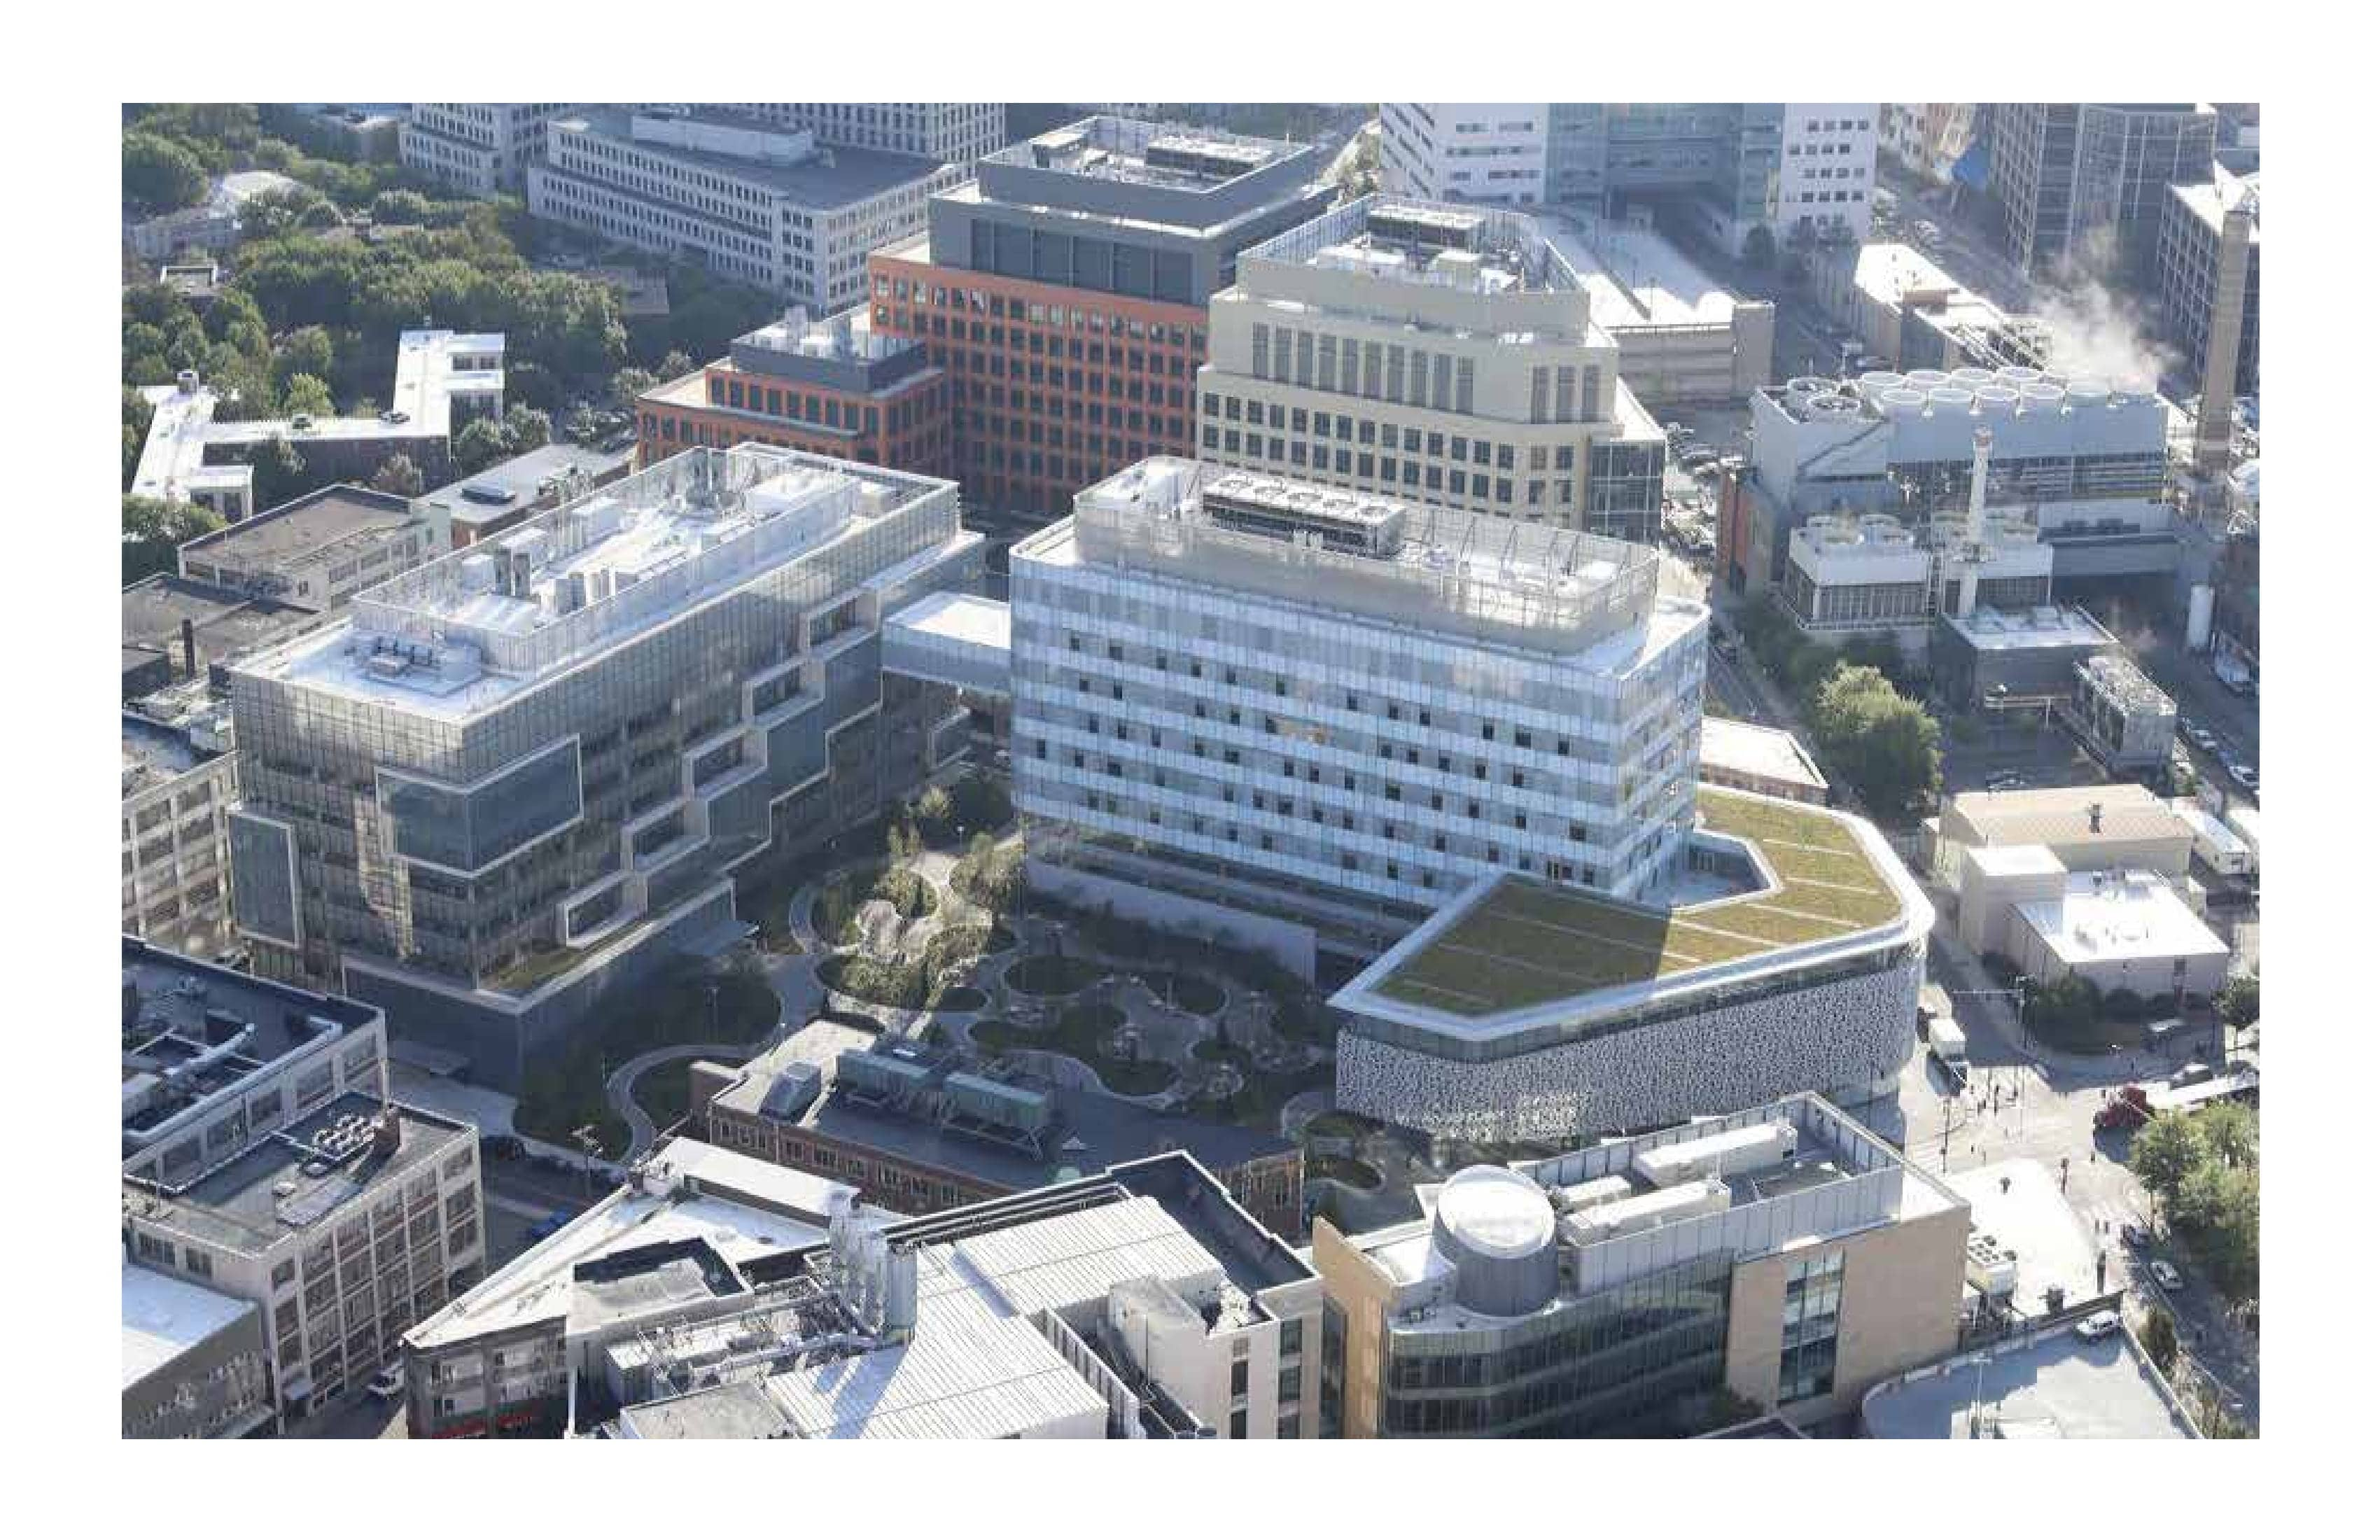 Aerial view of Novartis complex Iwan Baan